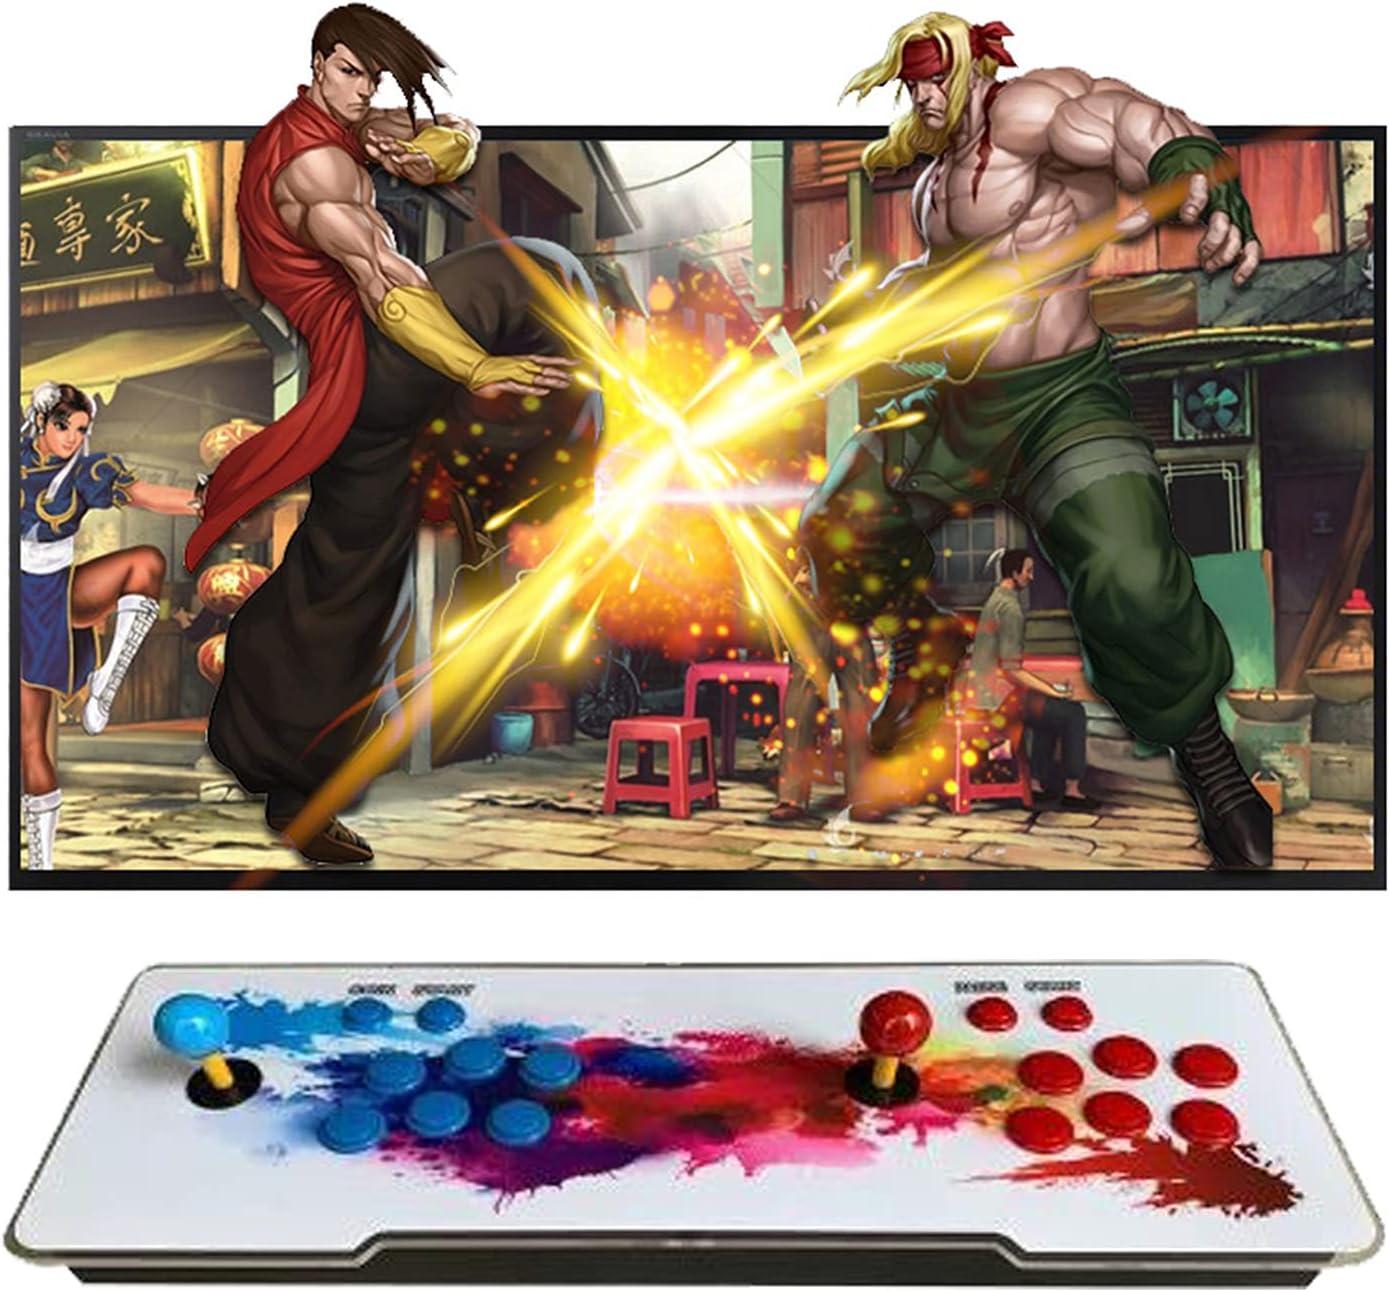 TANCEQI 4260 Games in 1 Arcade Game Cla Super sale Box 9S Bombing free shipping Pandora's Console